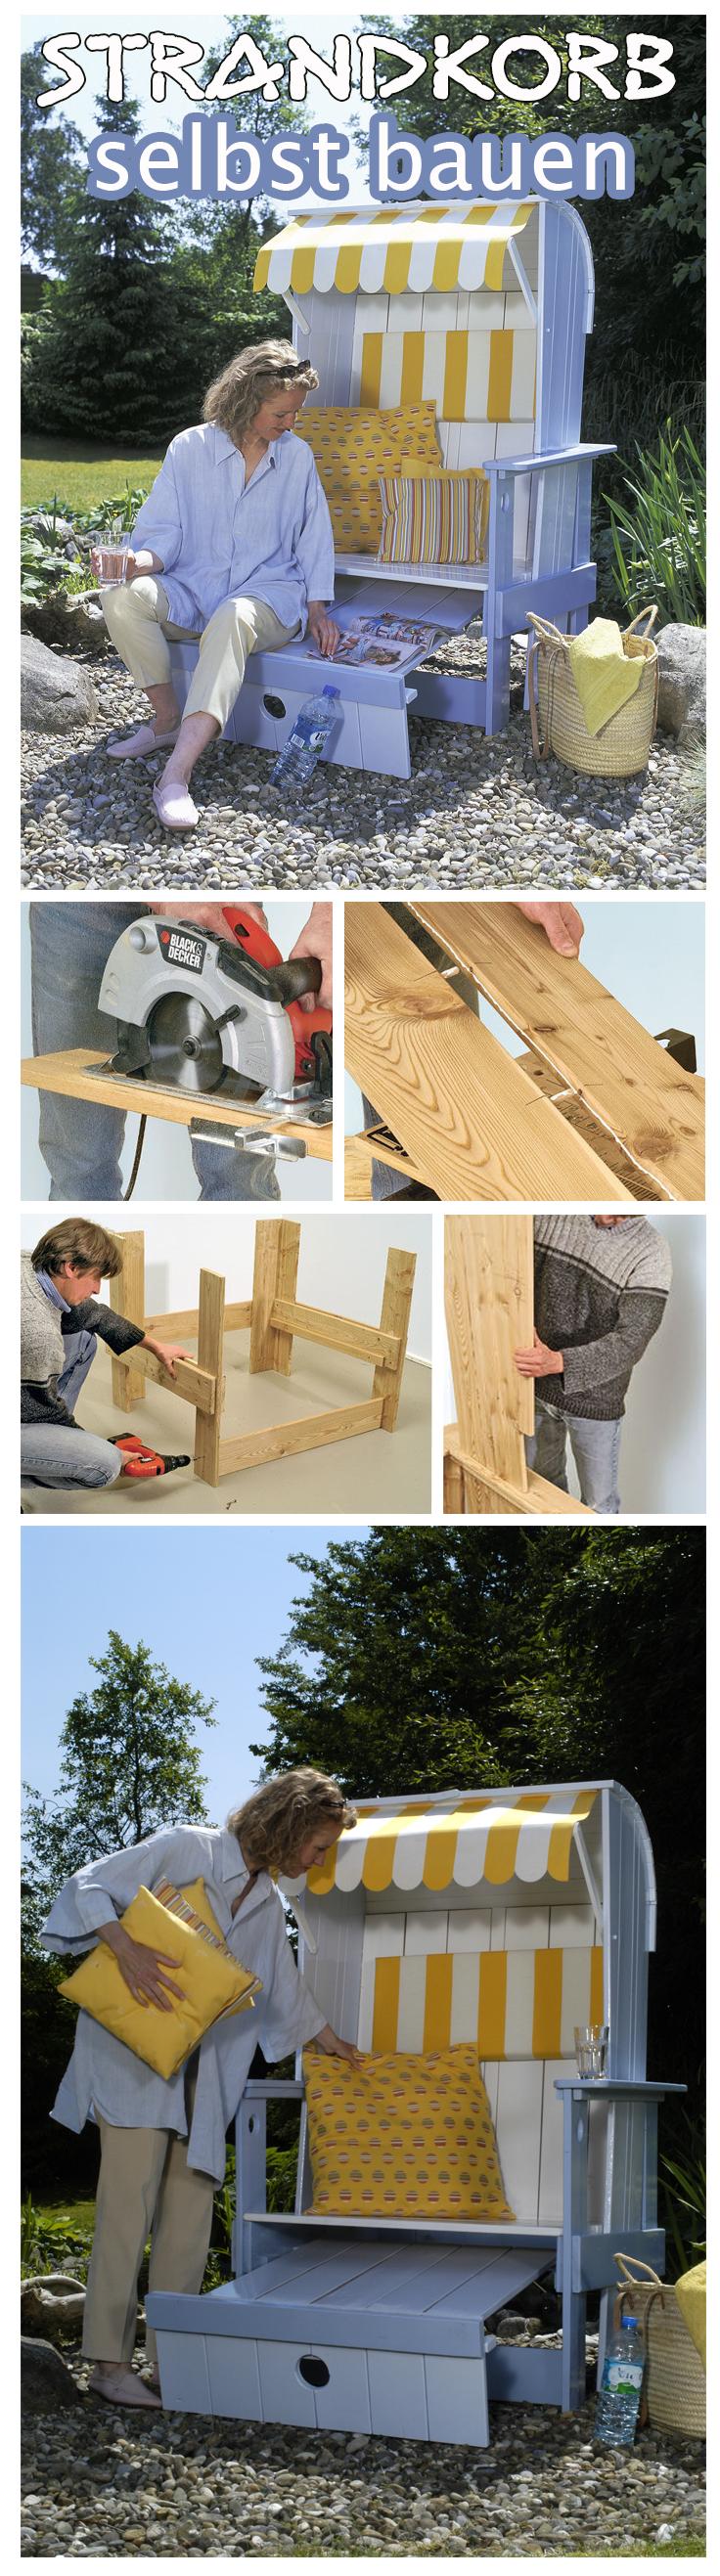 strandkorb sonnenliege strandkorb und selbst bauen. Black Bedroom Furniture Sets. Home Design Ideas